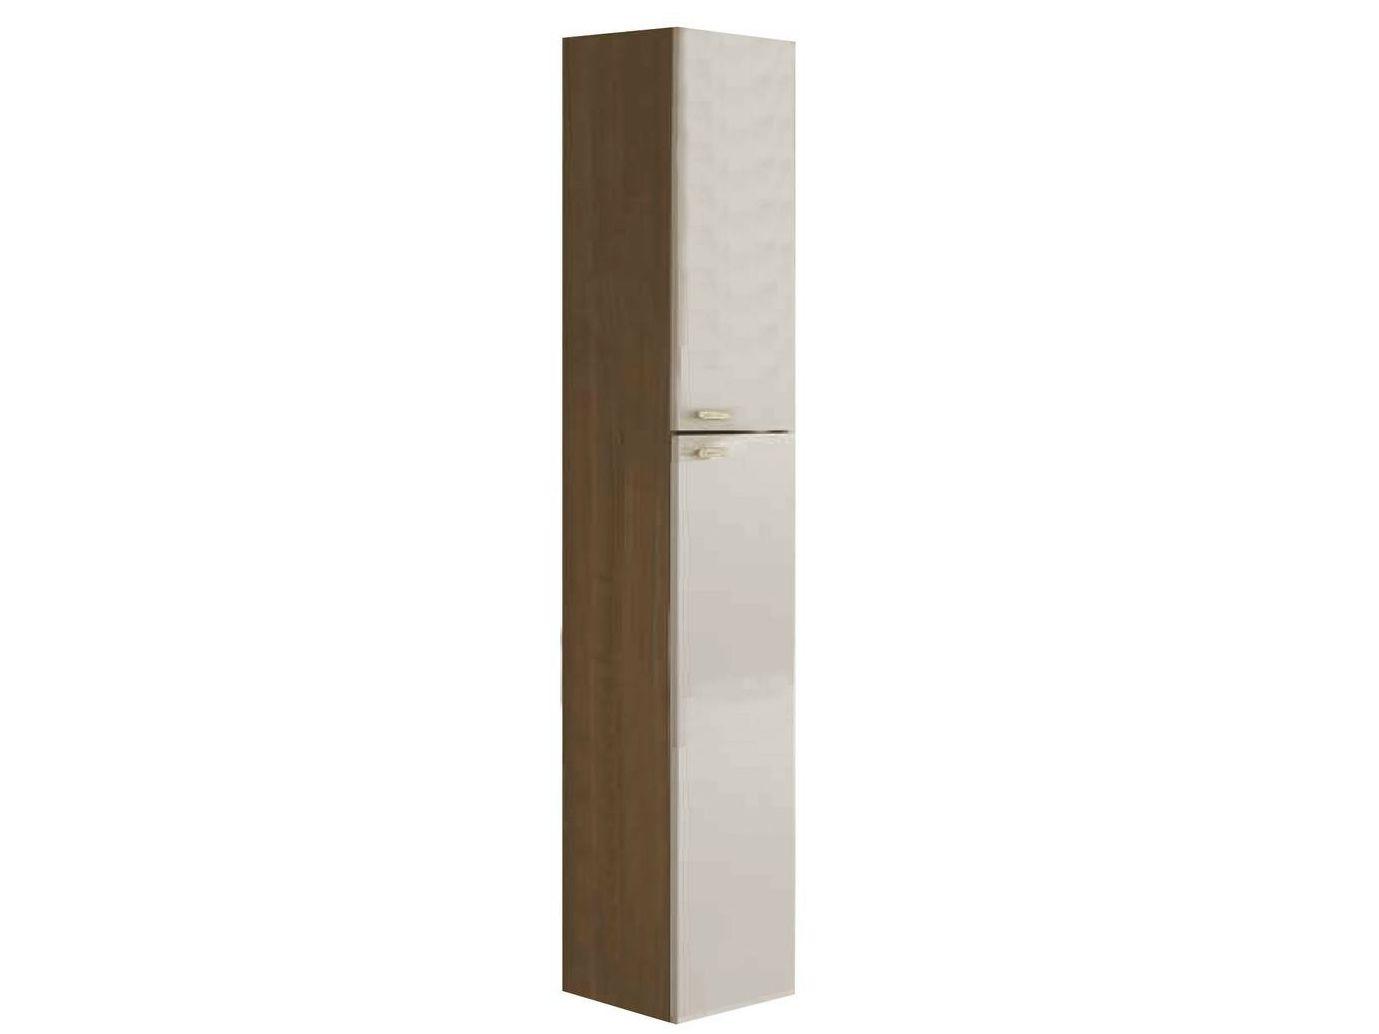 Meuble pour salle de bain haut avec portes connect e6853 for Meuble pour collection